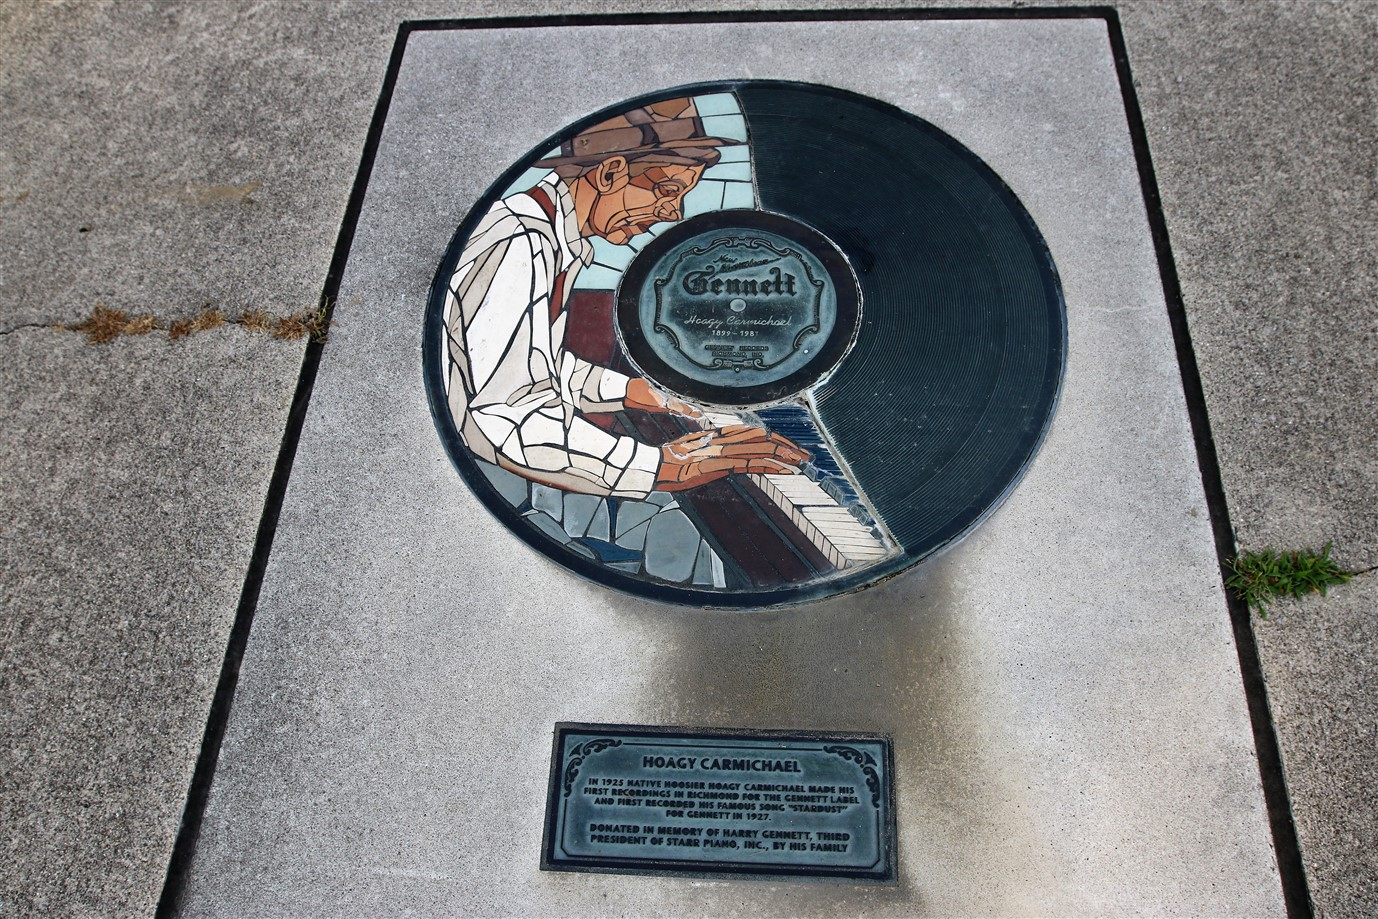 2018 07 17 419  Richmond IN Gennett Records Walk of Fame.jpg